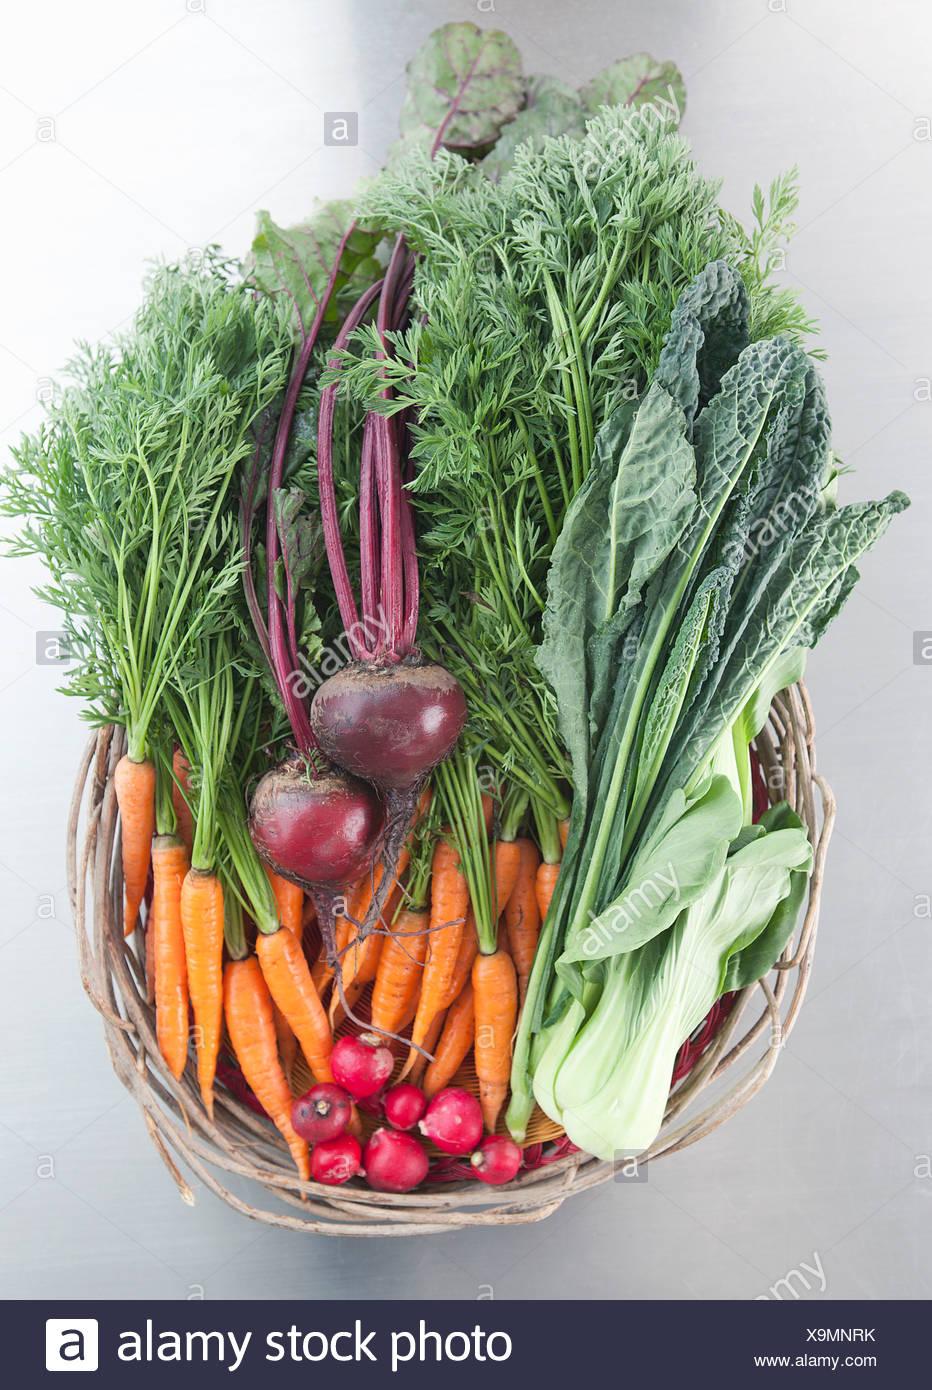 Korb mit frischem Gemüse Stockbild